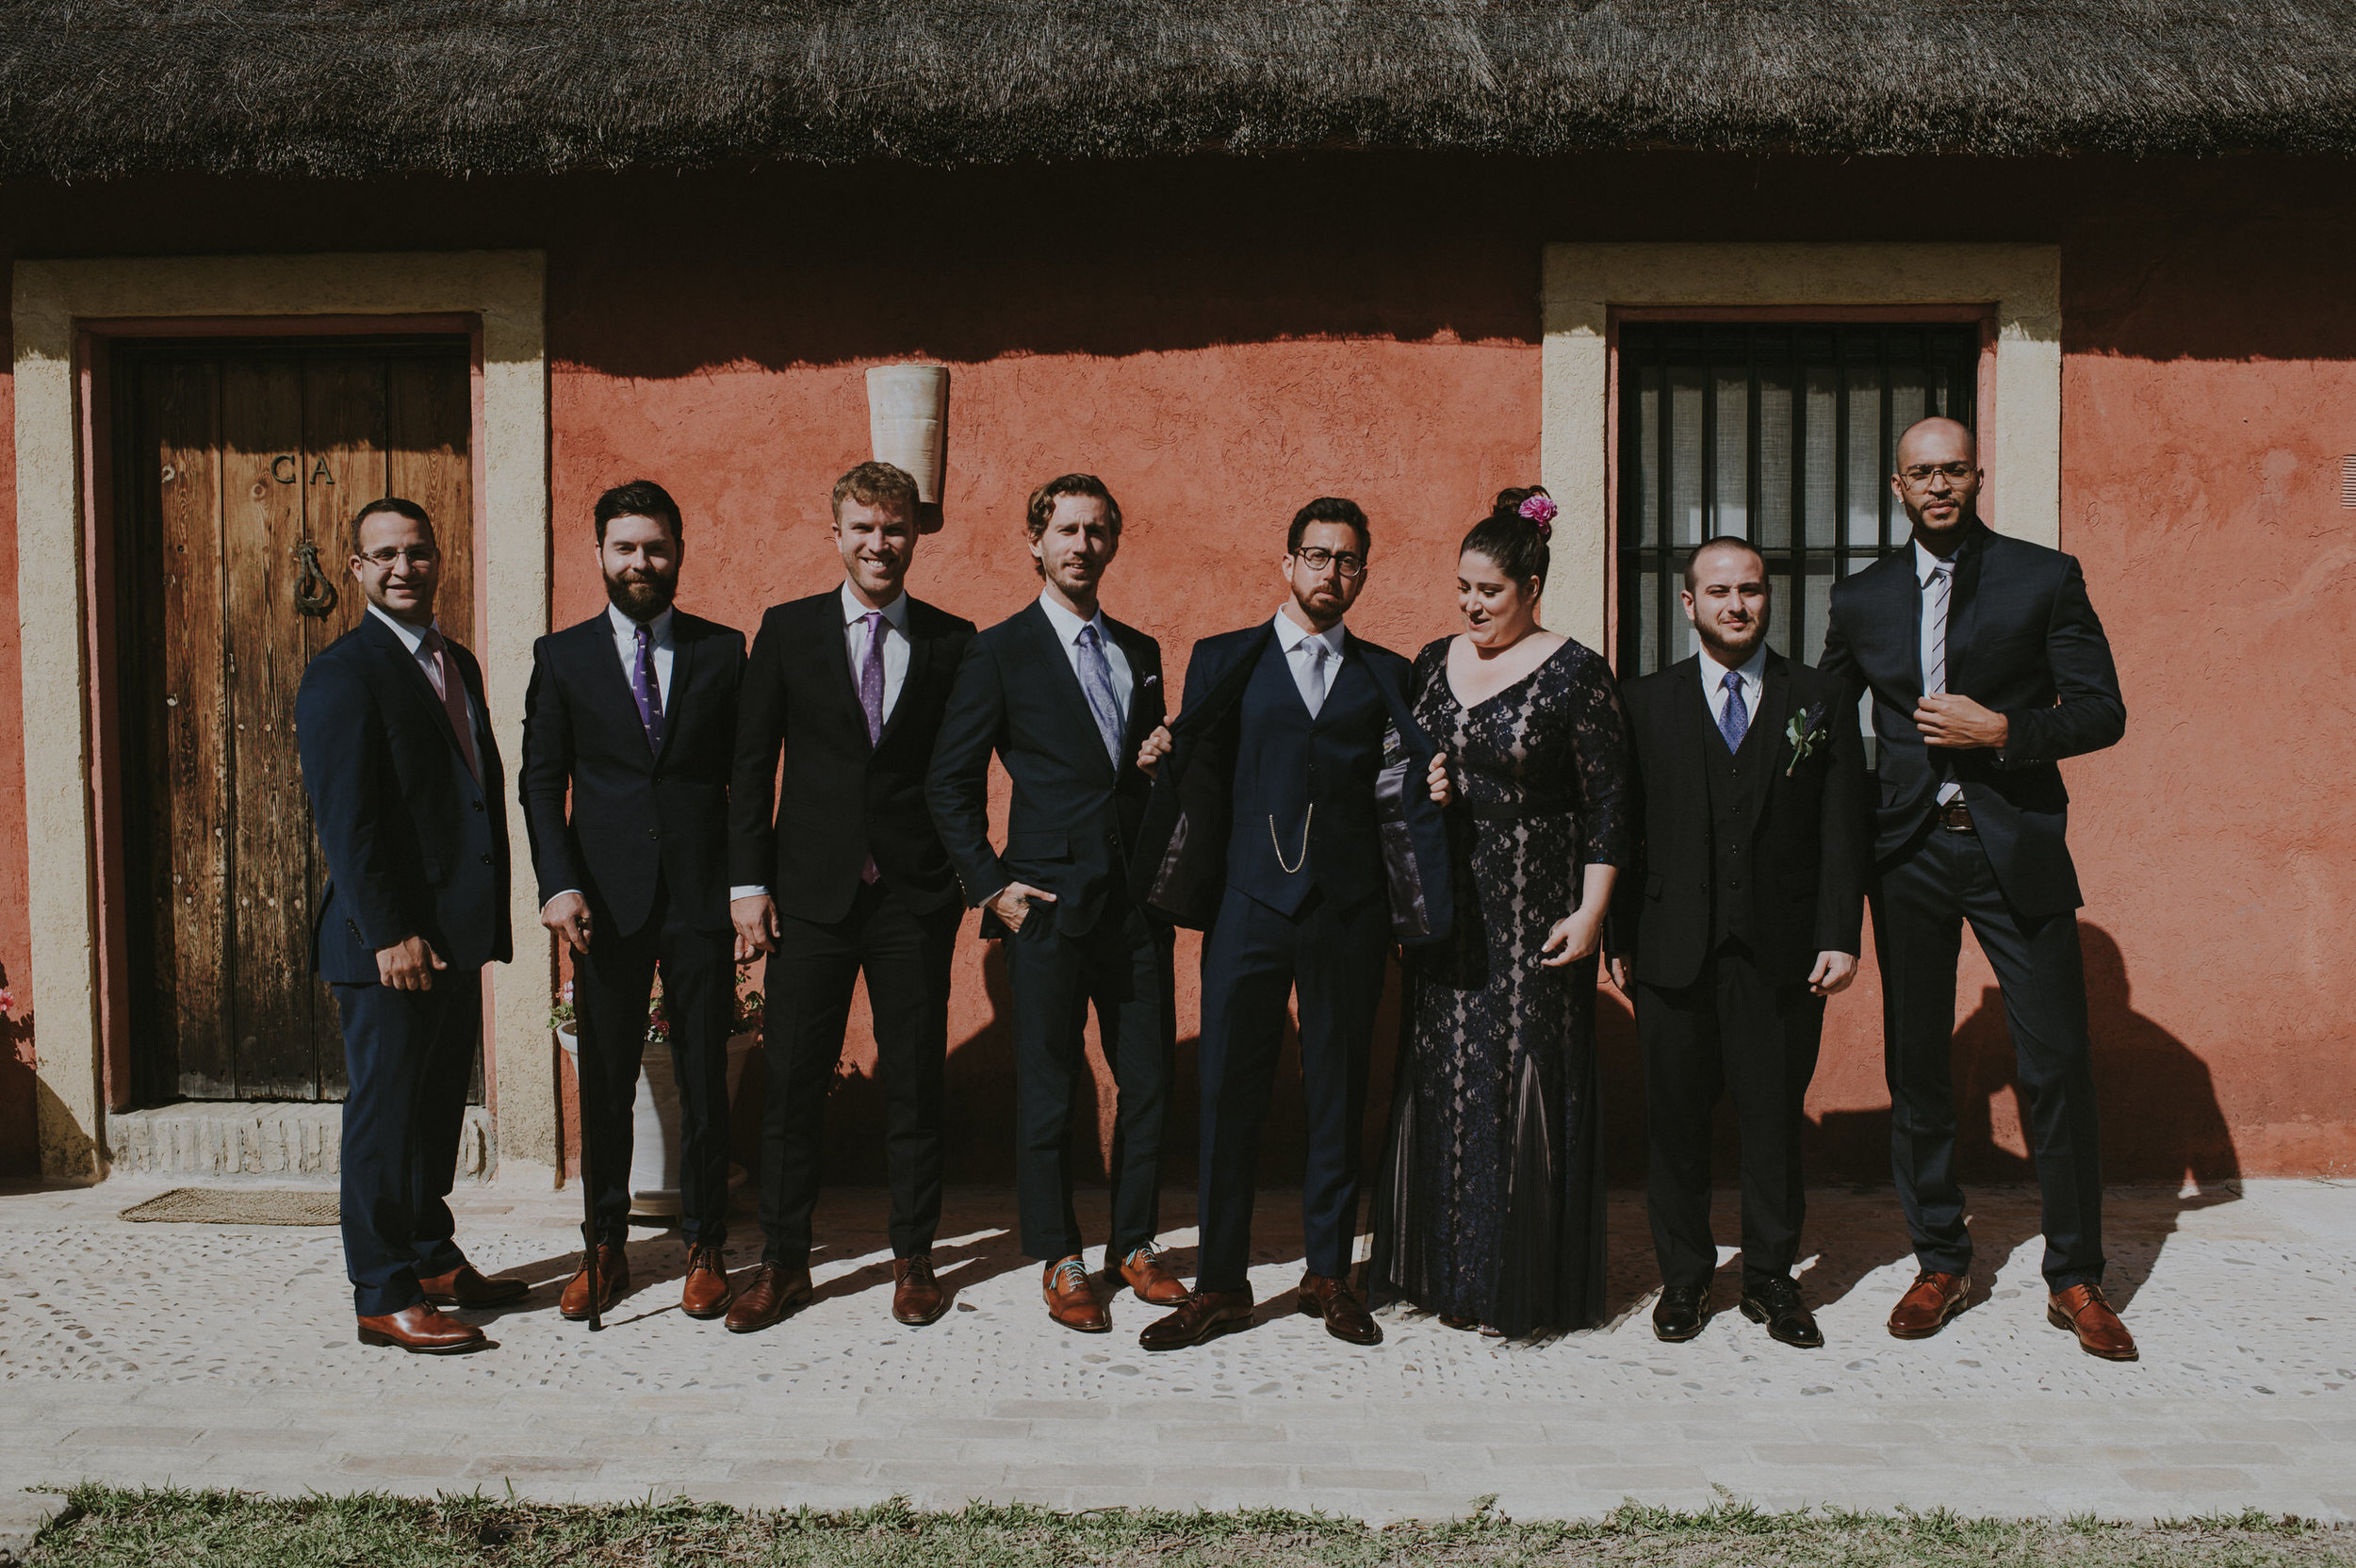 Andres+Amarillo+fotografo+boda+sevilla+natural+sin+poses+hacienda+san+rafael (27).JPG